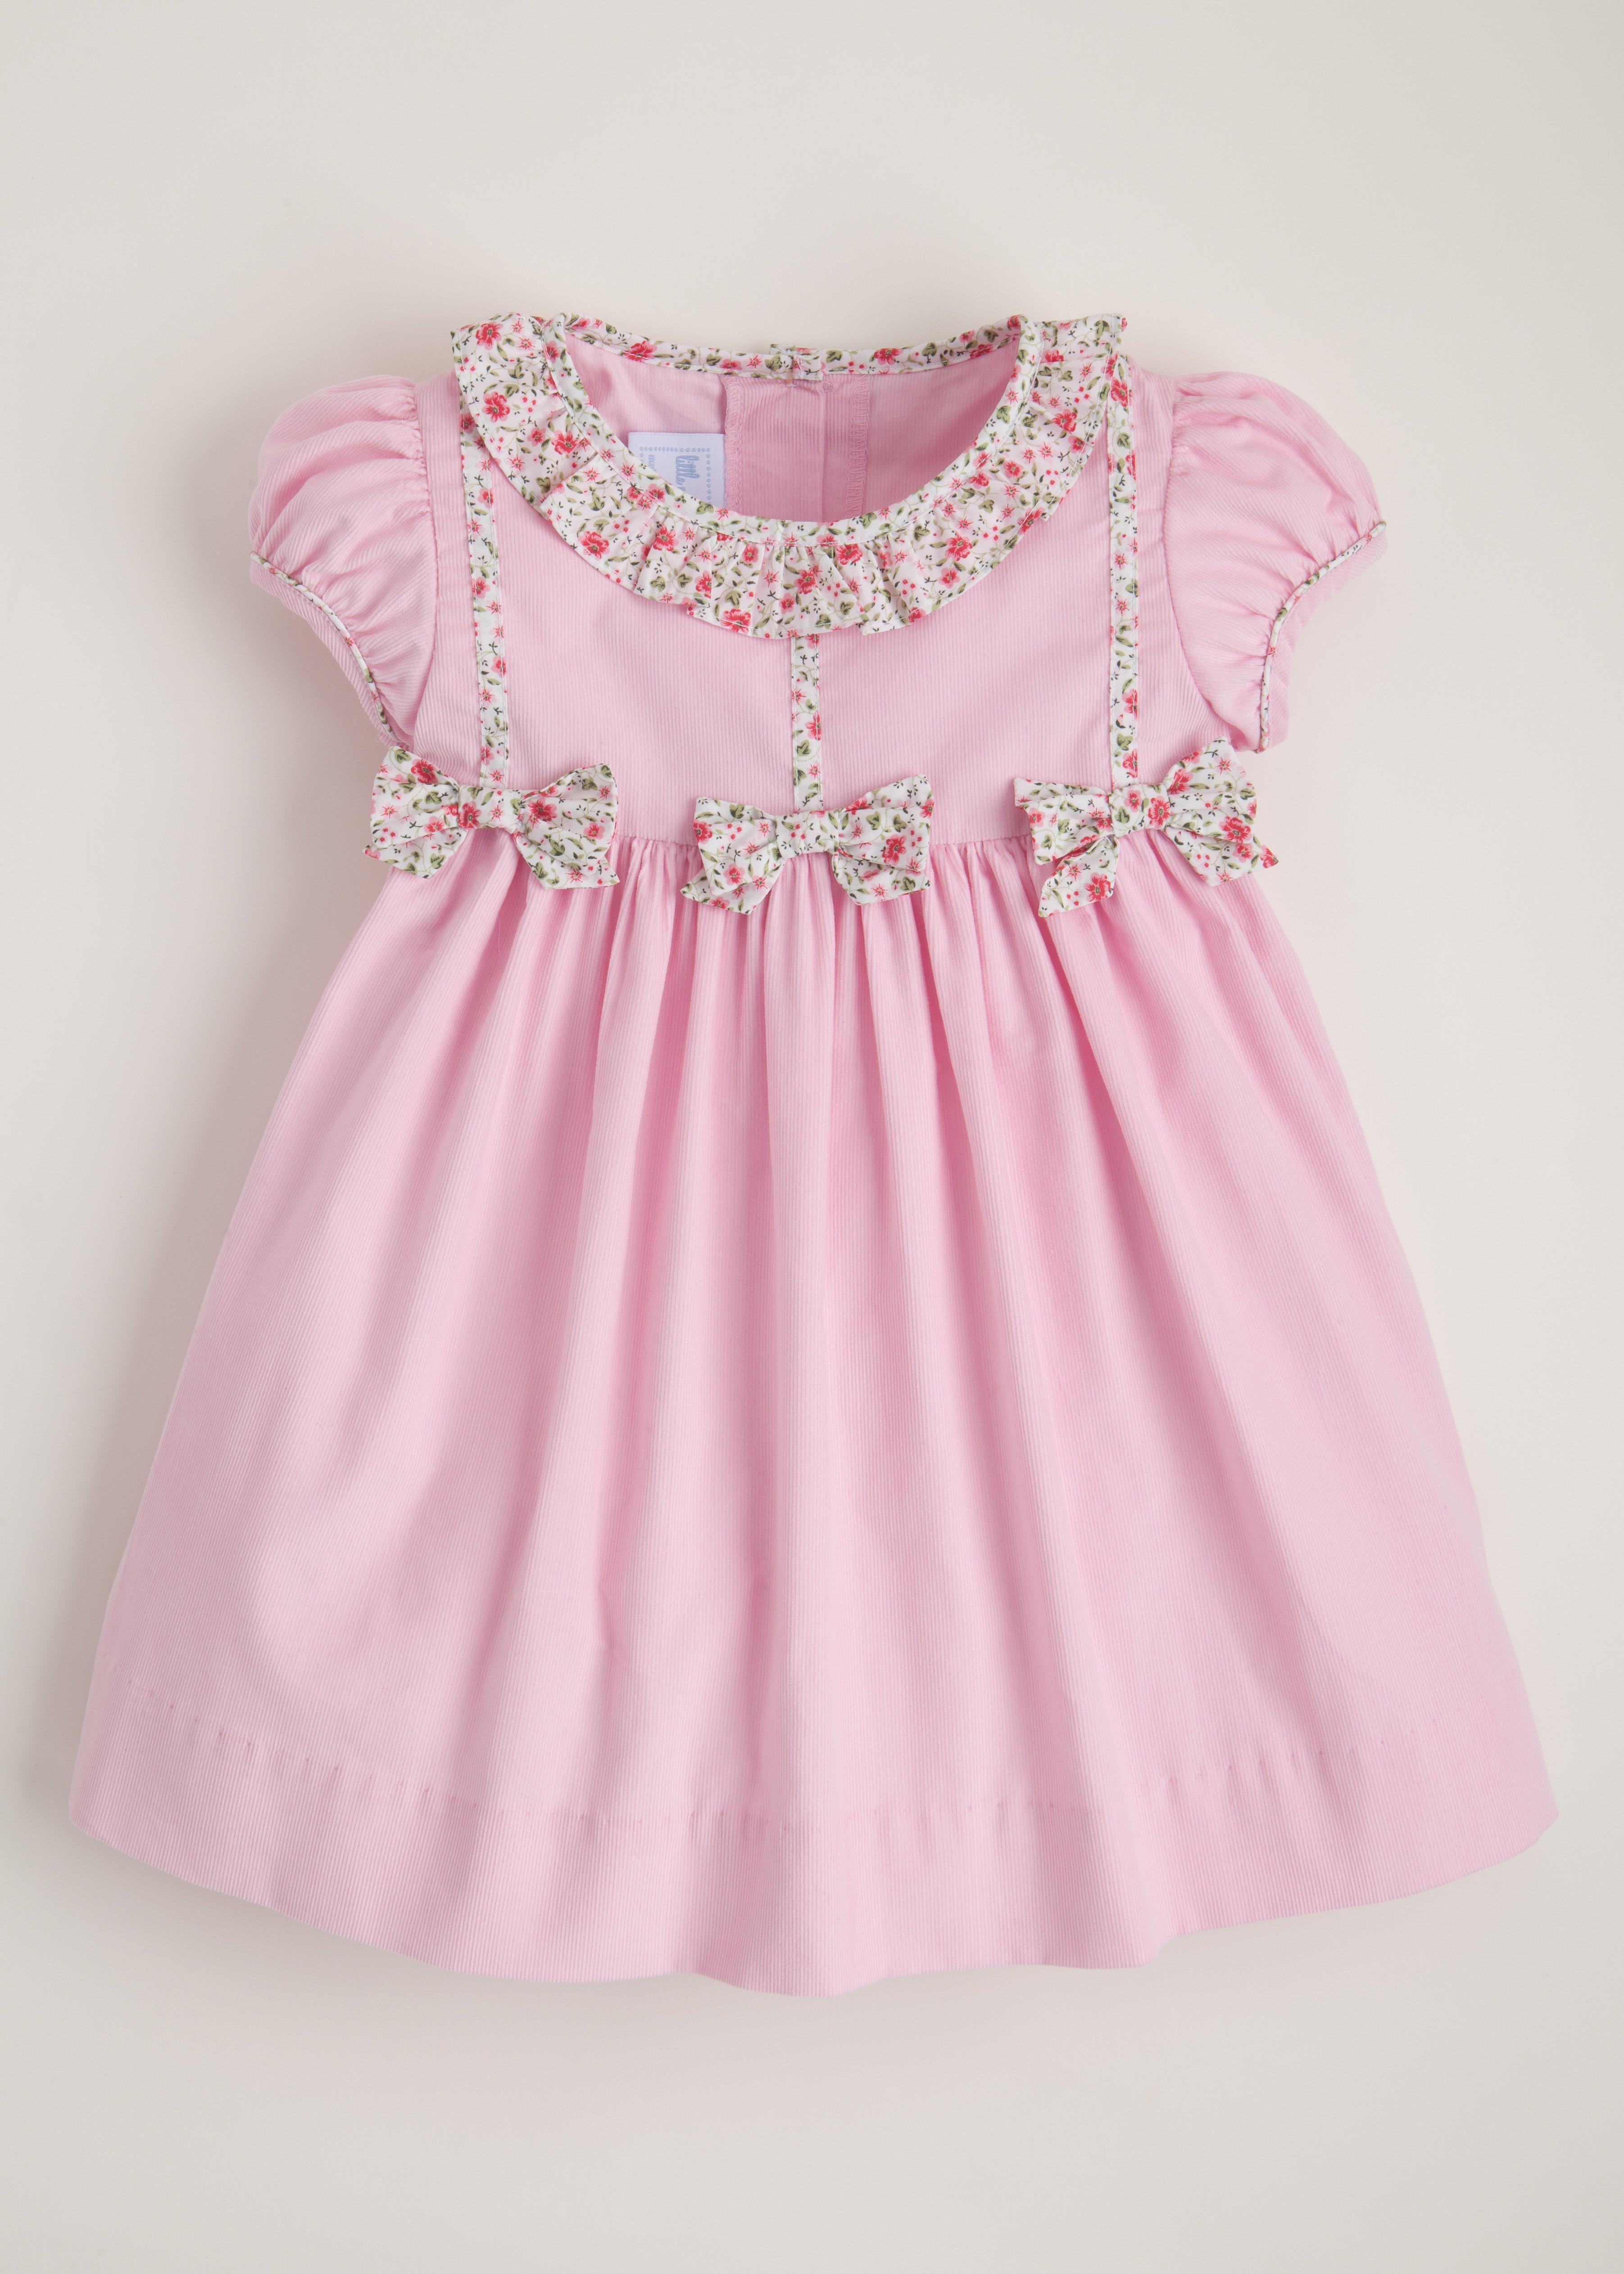 Baby White-12 Months Petit Bateau Pique Dress with Pockets